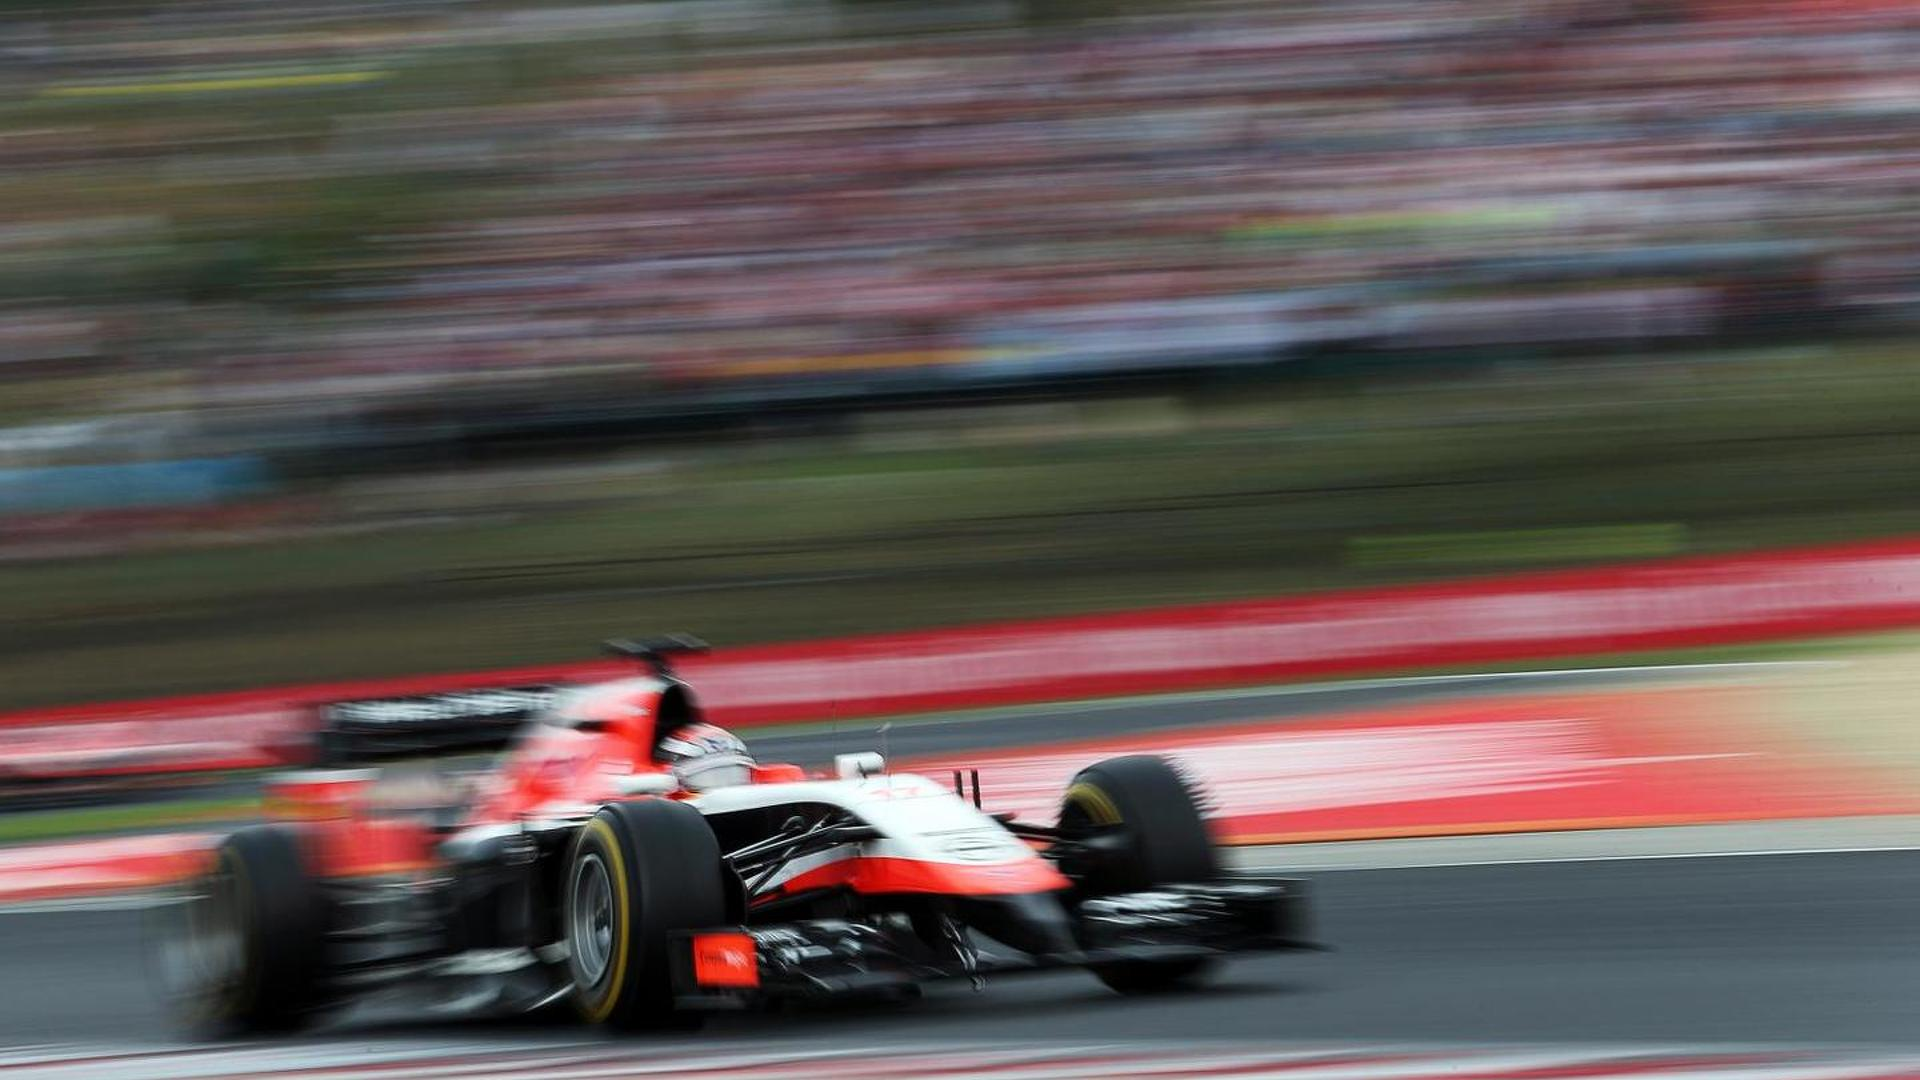 Bianchi not ruling out '2015' Ferrari race seat